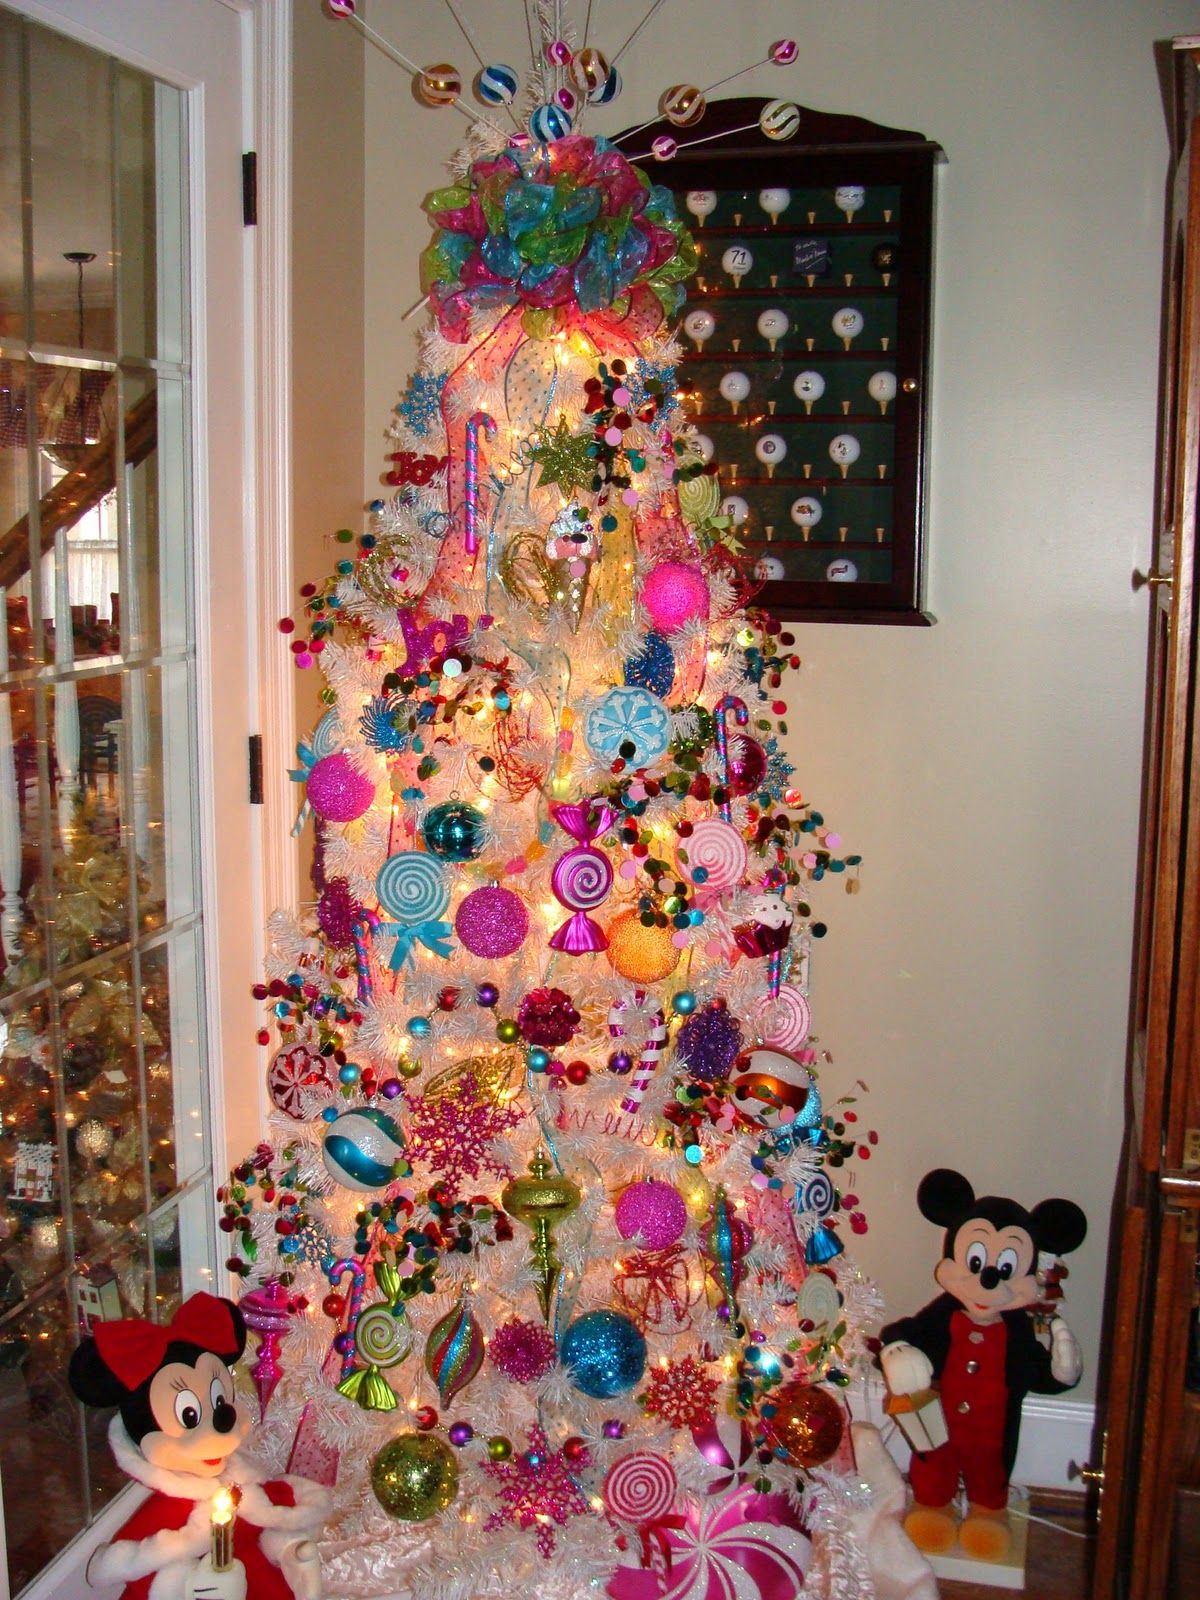 35 Disney Christmas Decorations Ideas Christmas tree